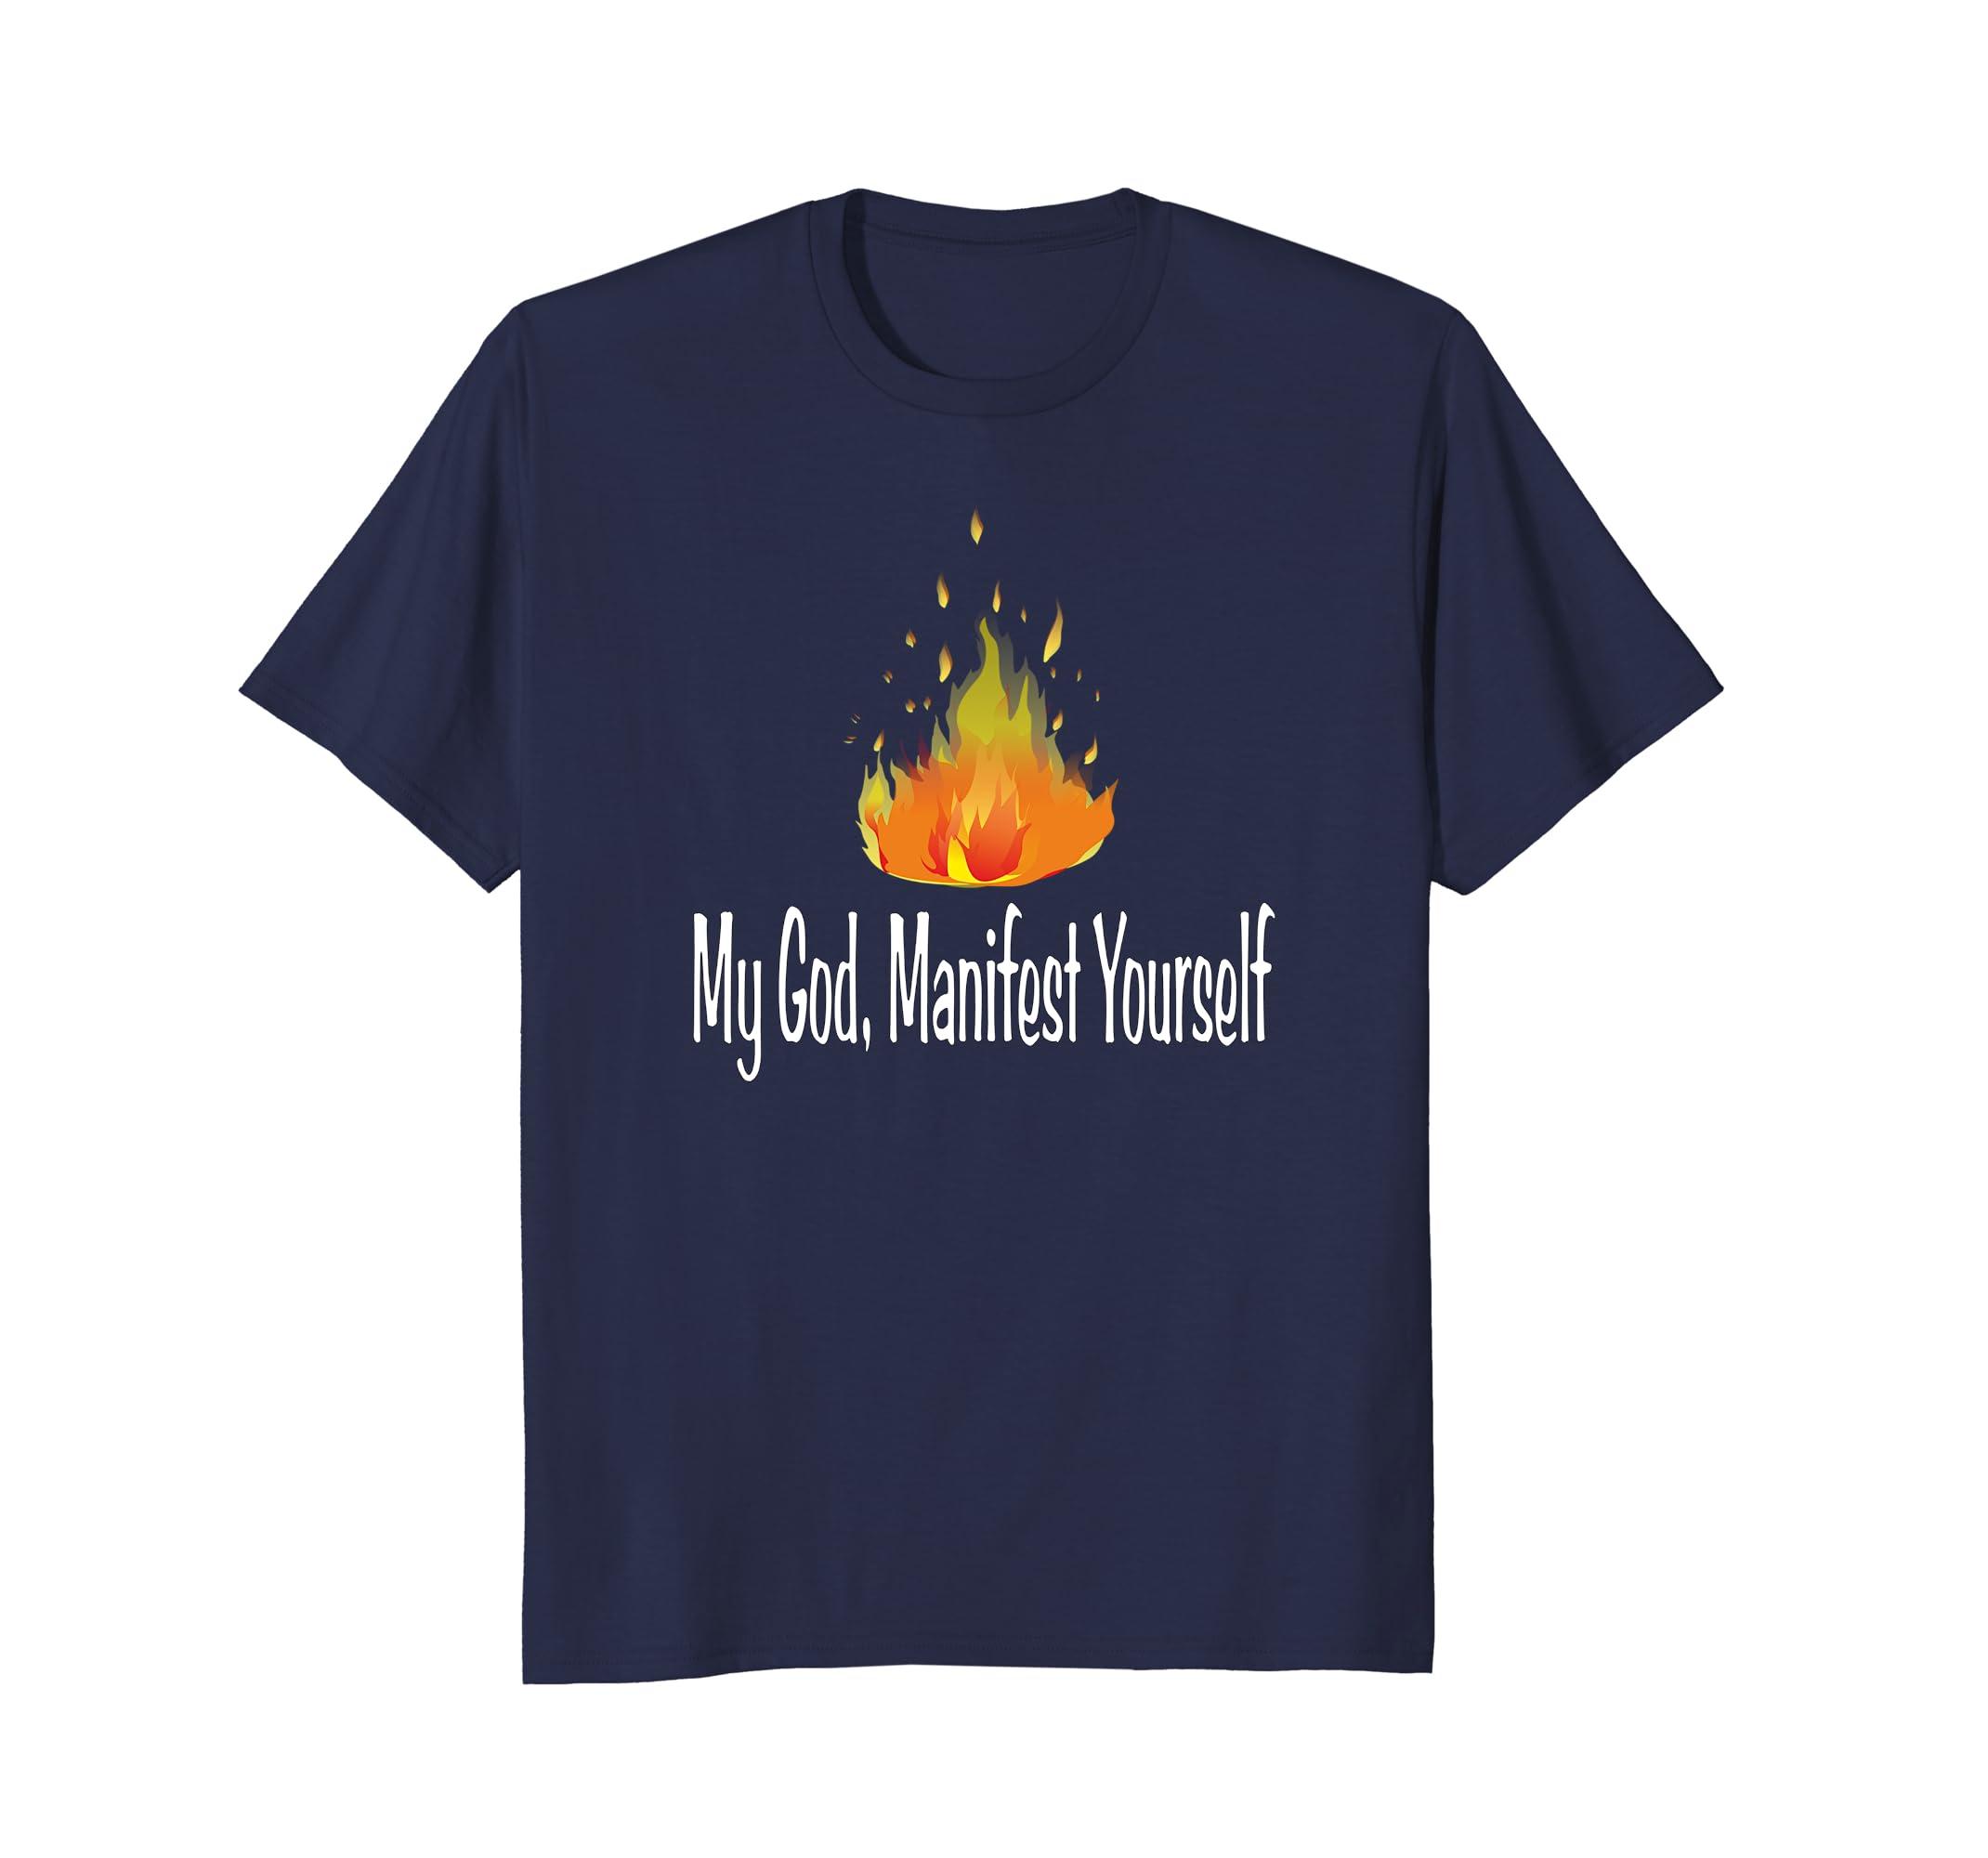 Yes God t.Shirt: My God manifest Yourself, Men, women, You- TPT